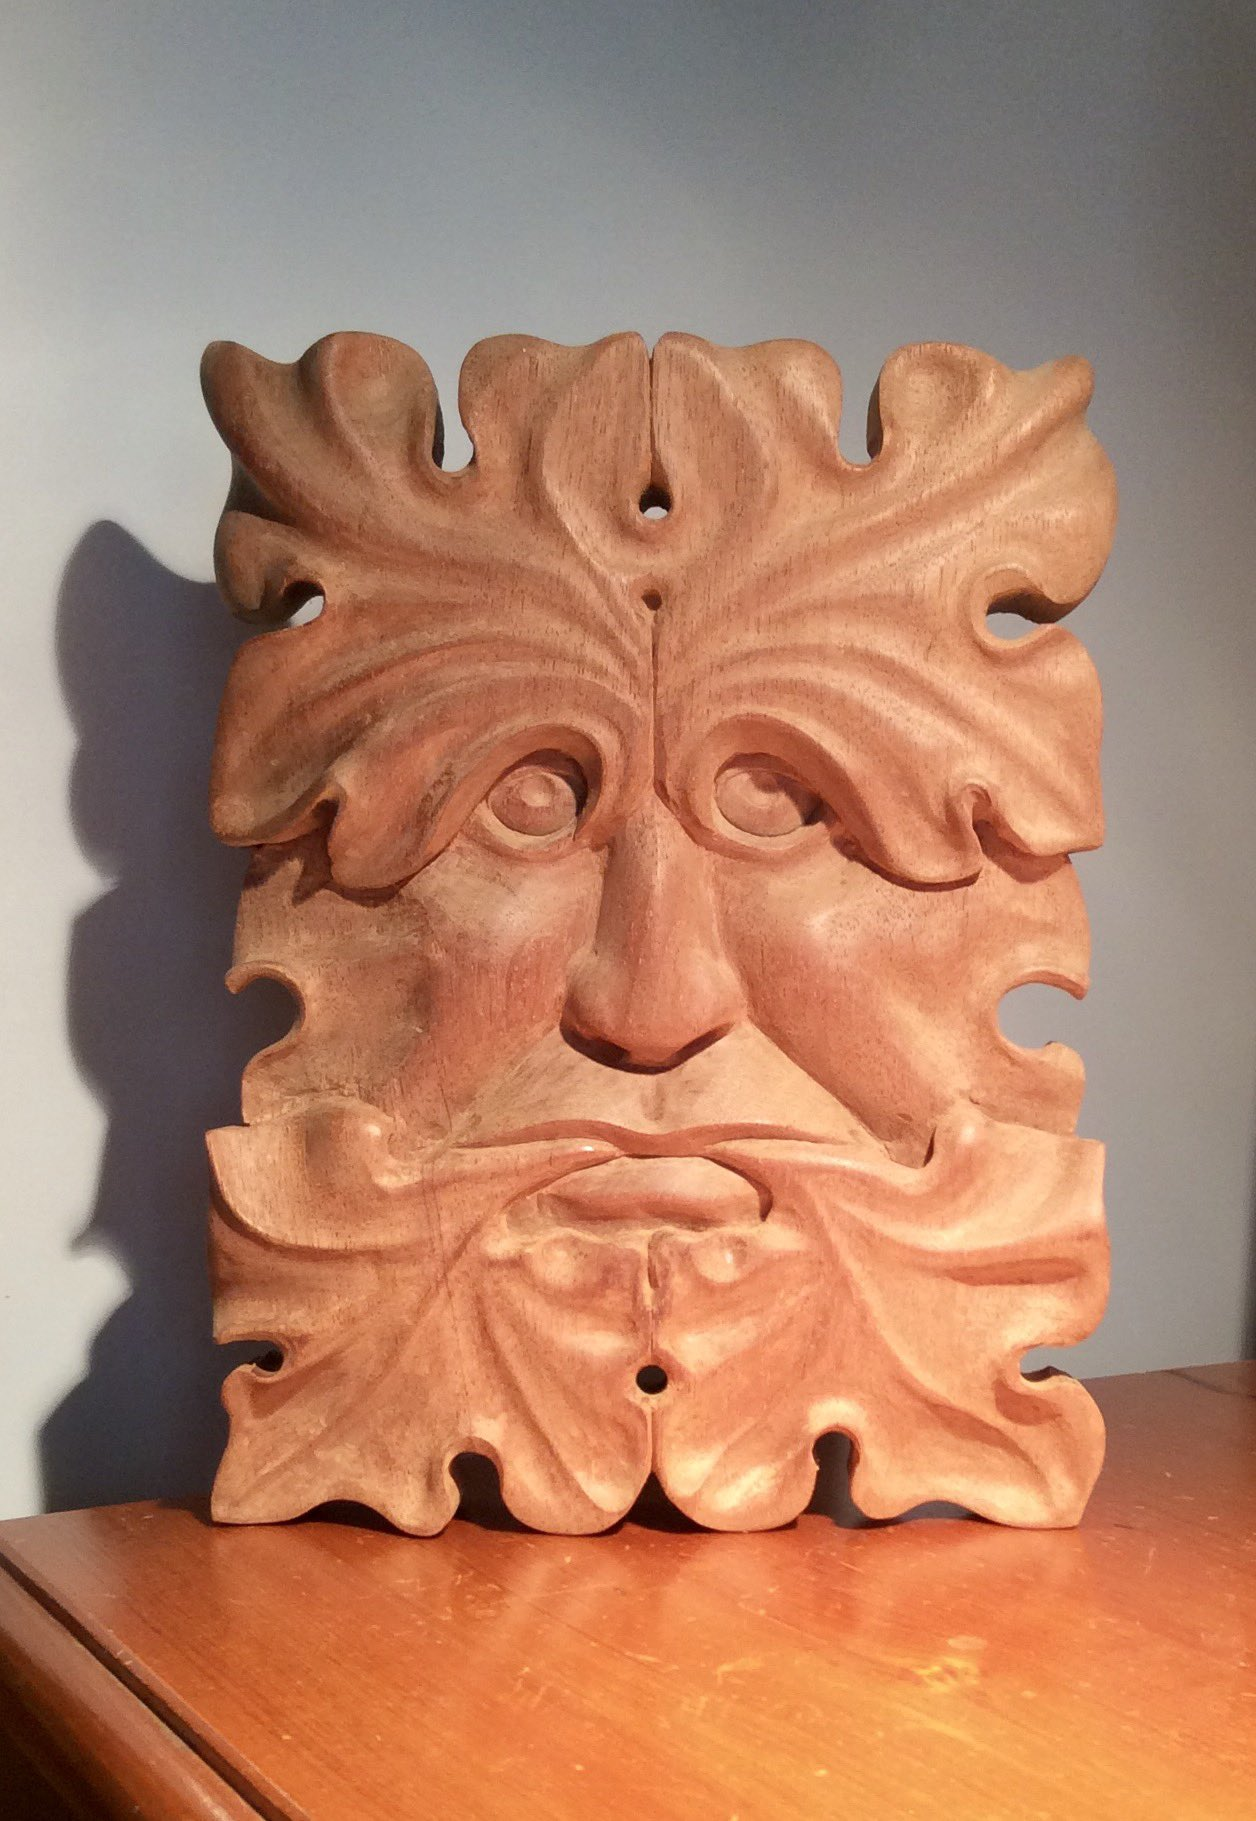 Mahogany green man of Ewyas befor & after wax https://t.co/lokc8Z2gDm